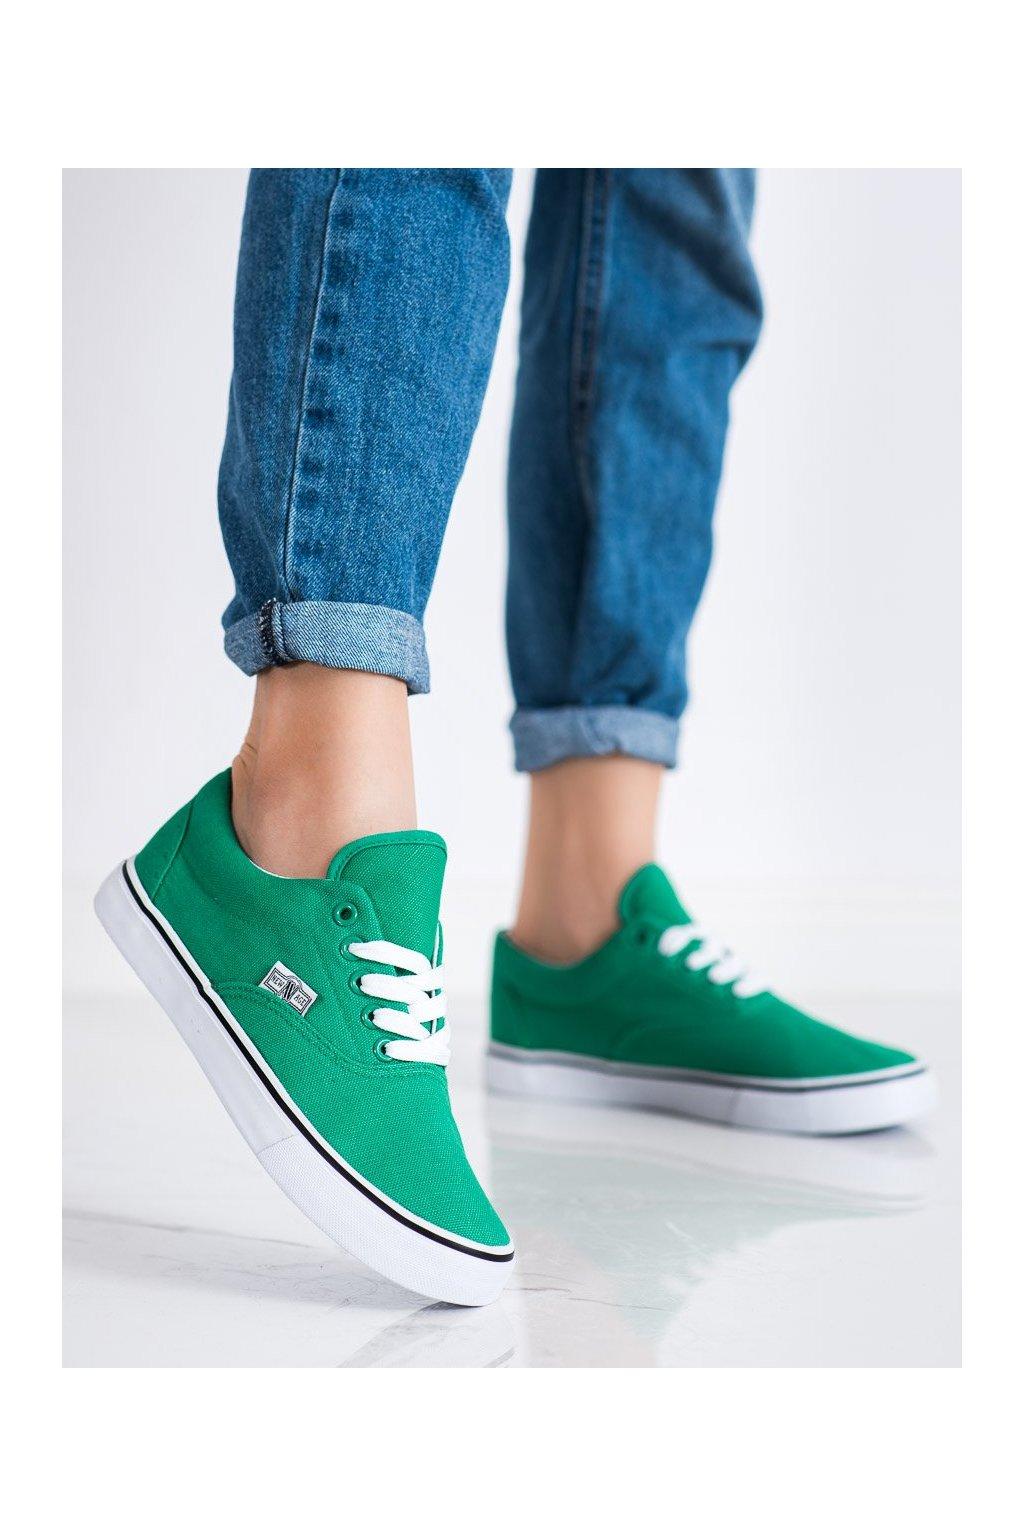 Zelené tenisky New age kod 086GR-GR